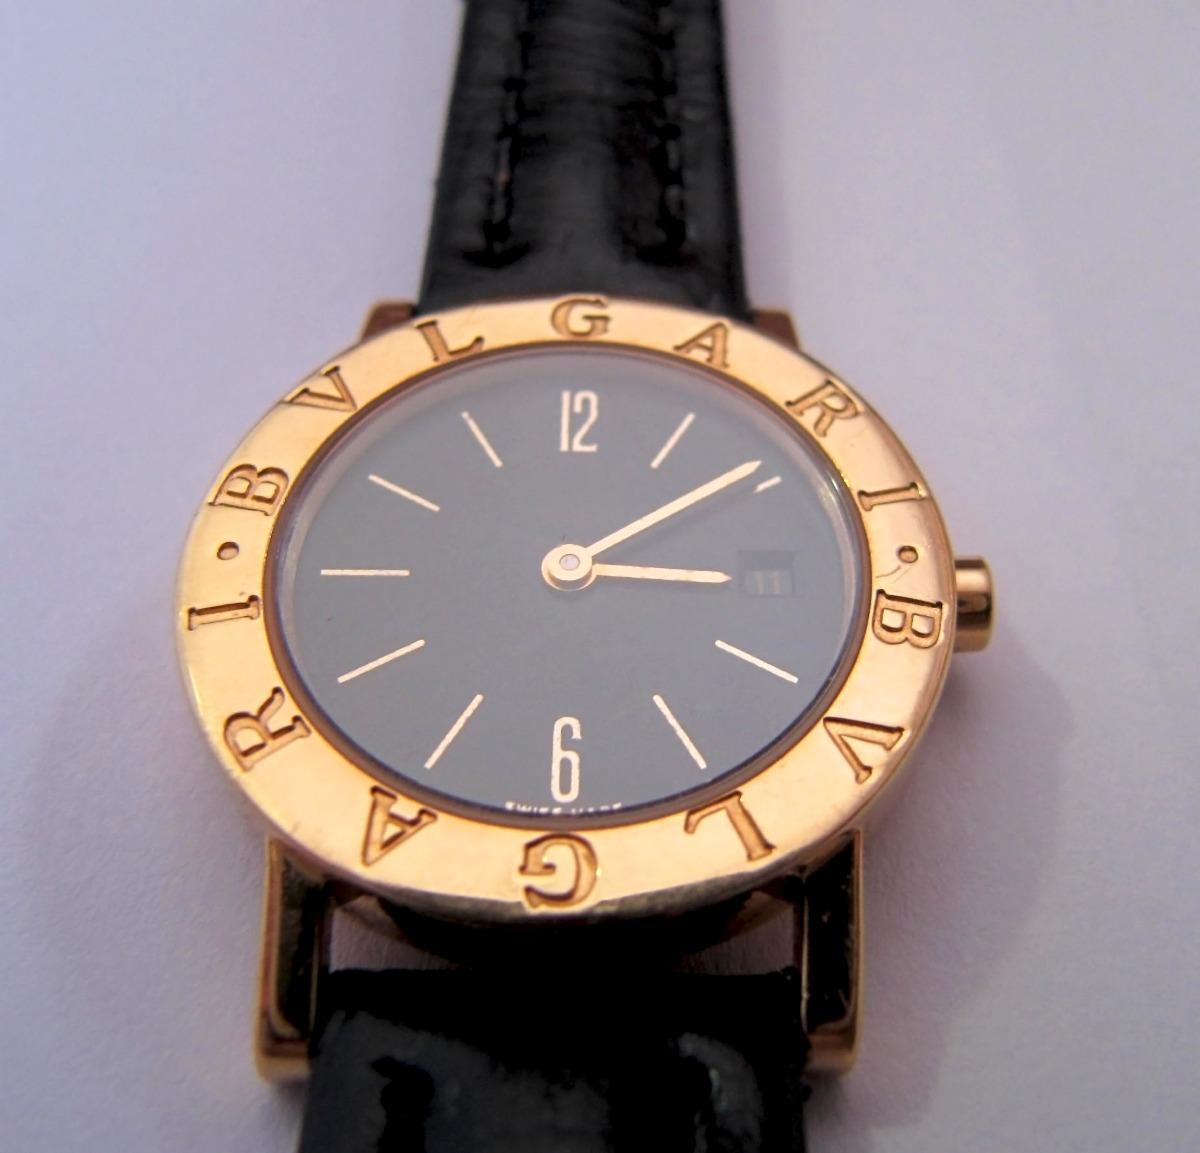 b6b7f4a4b00 relógio bvlgari bulgari bb 26 gl feminino quartzo ouro. Carregando zoom.